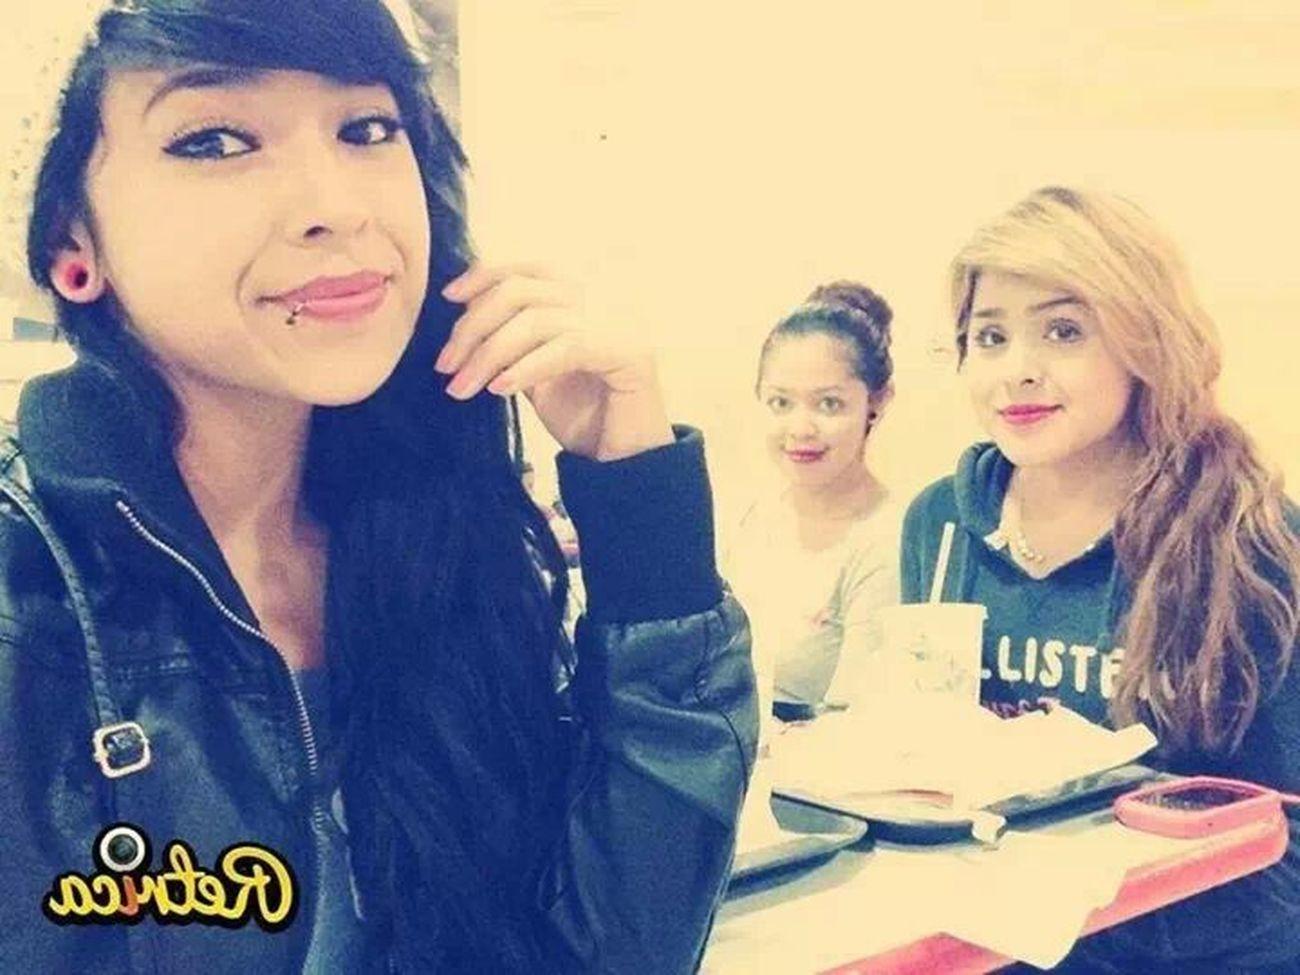 me and my Sisterr amd my Mainnigga TurnUp Dopehoodie ♥ ~ xx